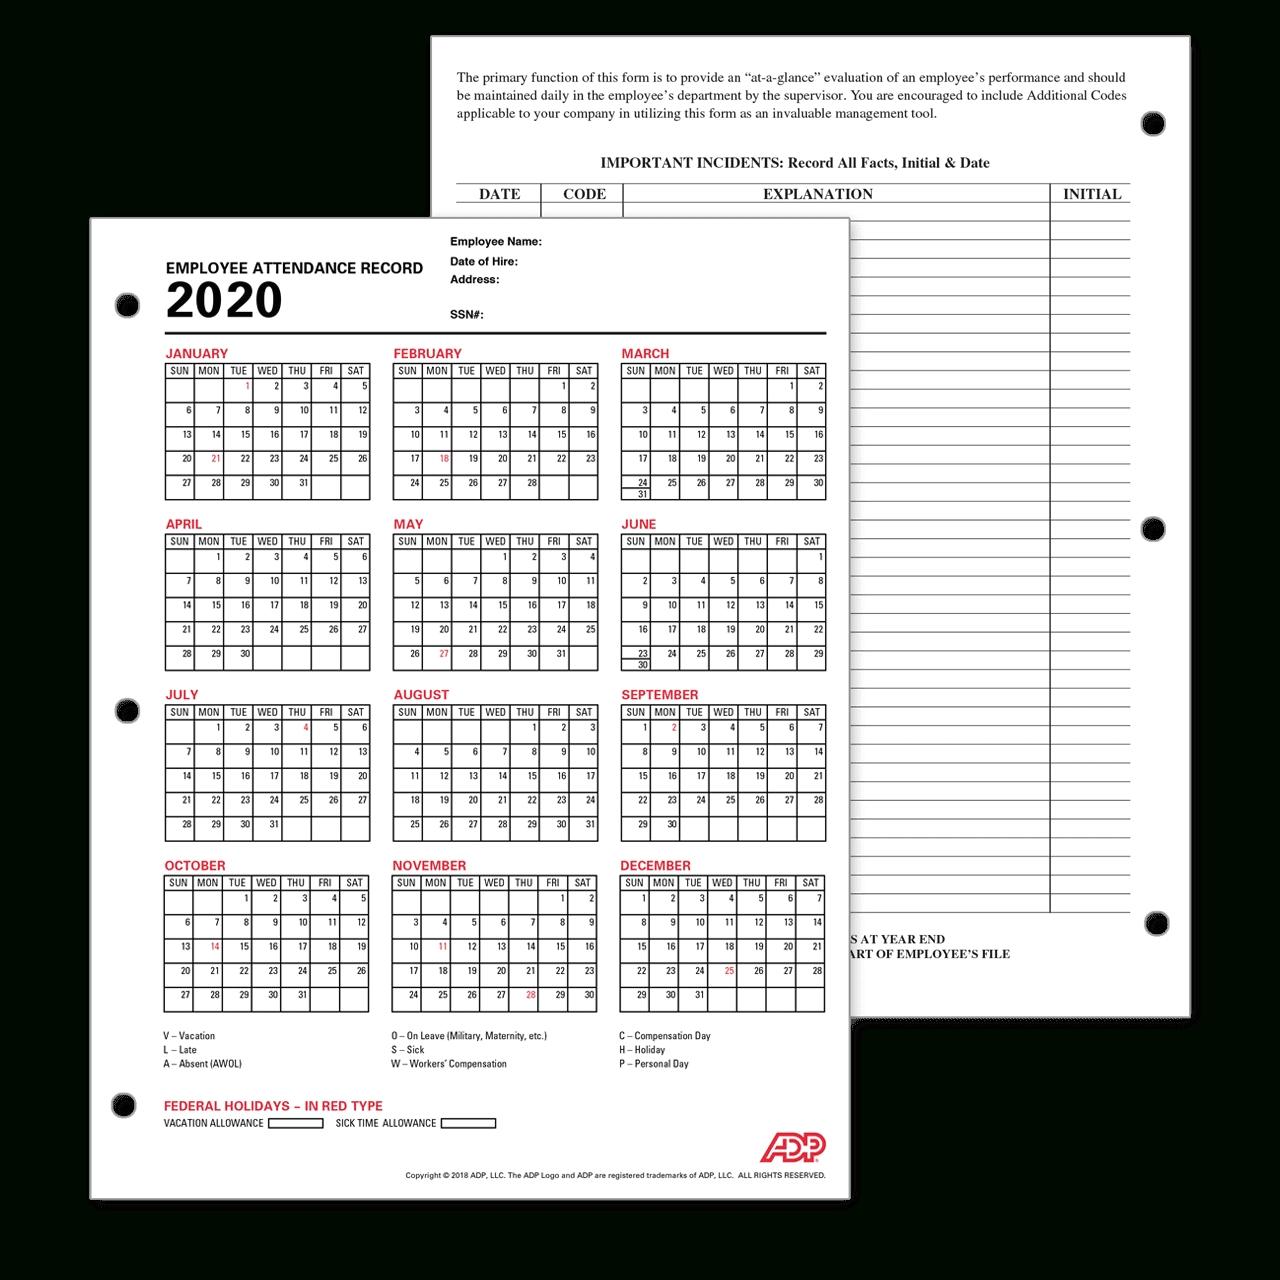 Adp Employee Attendance Record / Calendar throughout Printable Attendance Calendar For 2020